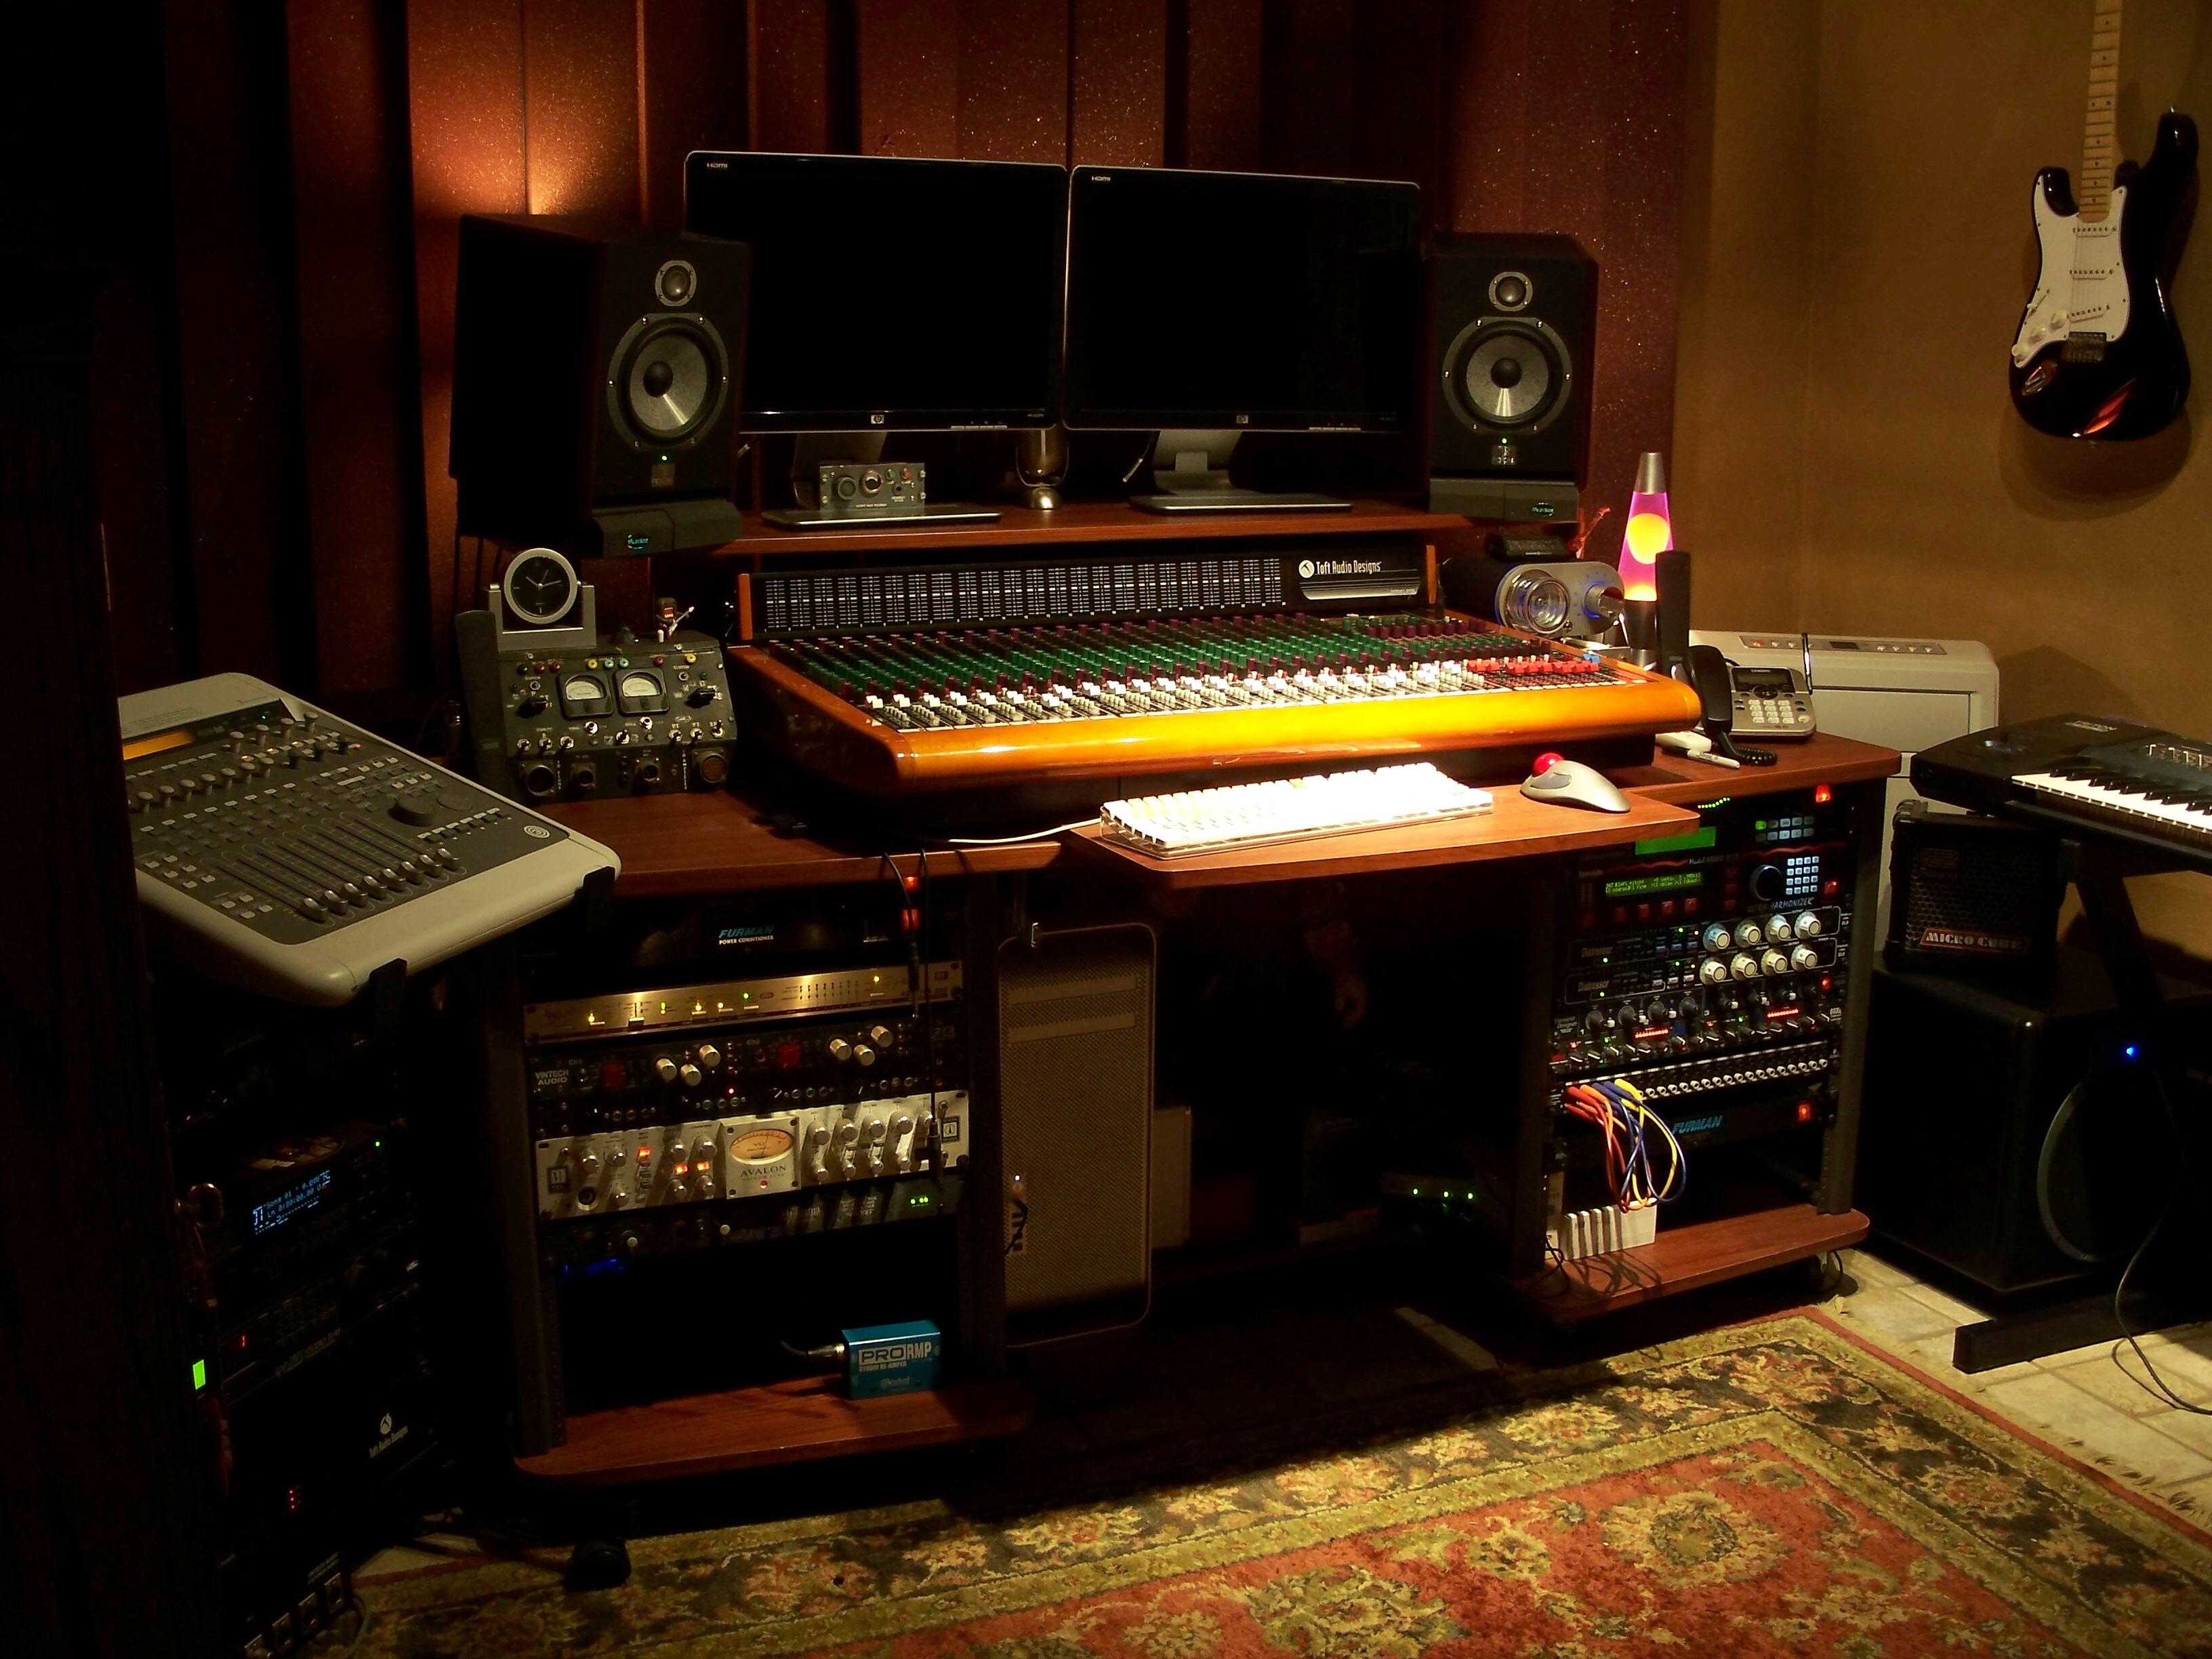 Gearslutz.com - View Single Post - Show me your *small* studio